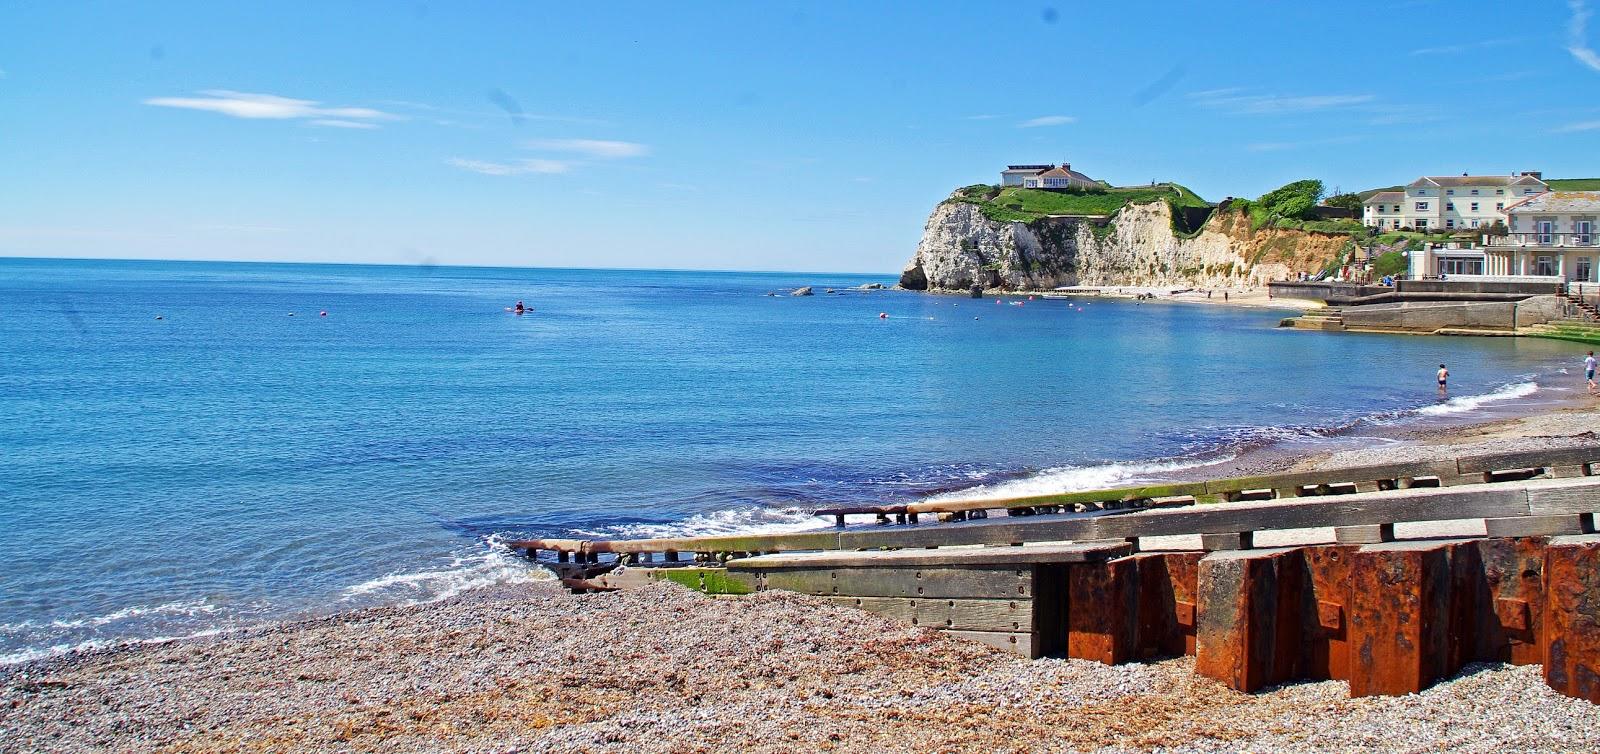 Isle of Wight Photo Diary